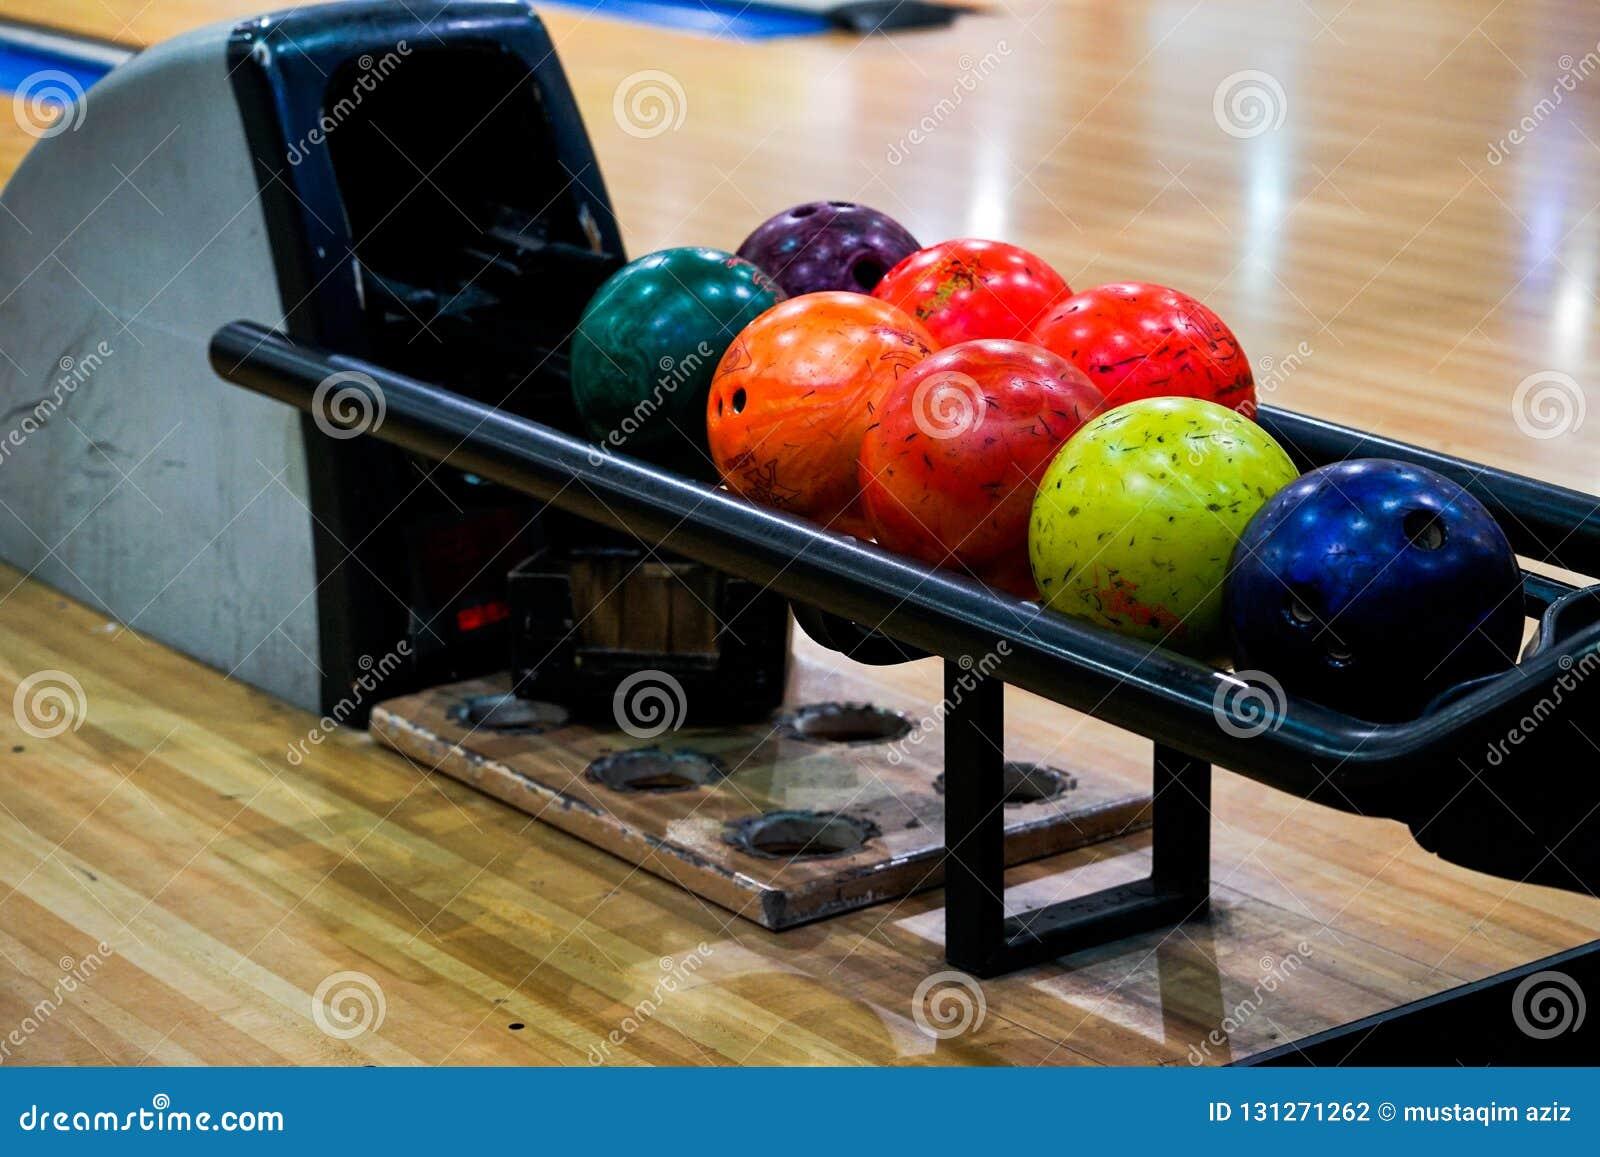 The bowling balls